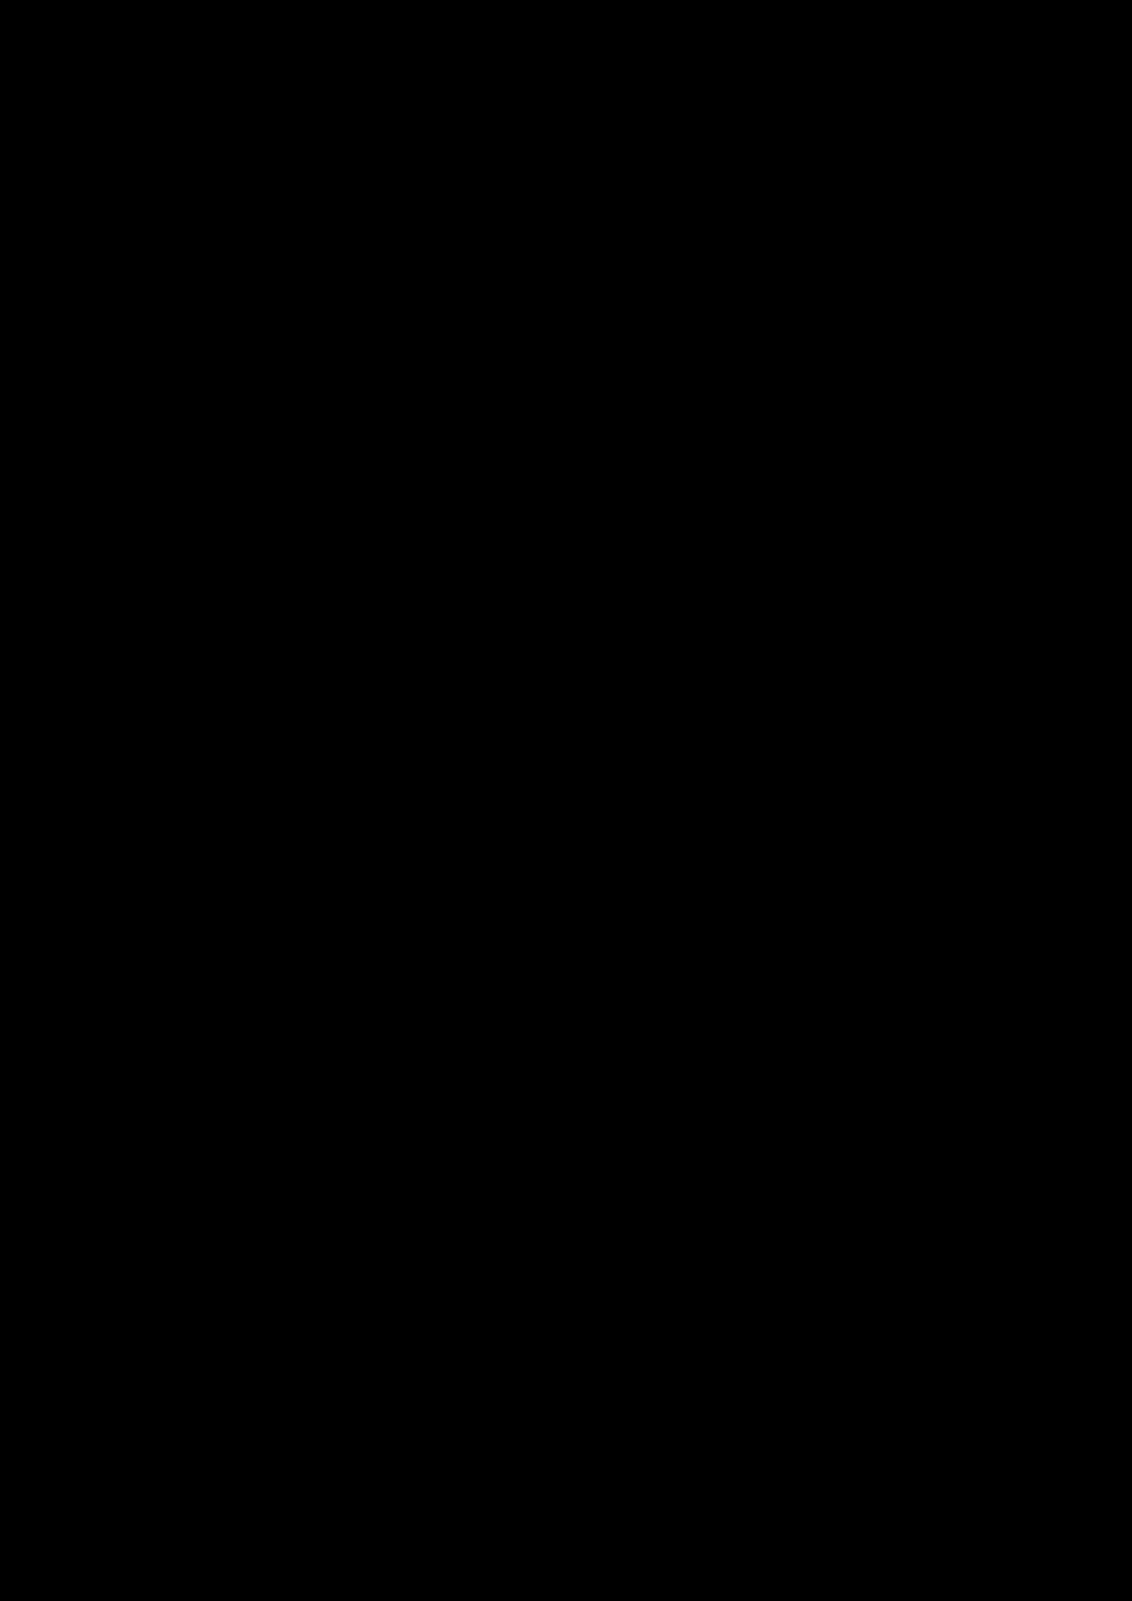 Belyiy sokol slide, Image 13